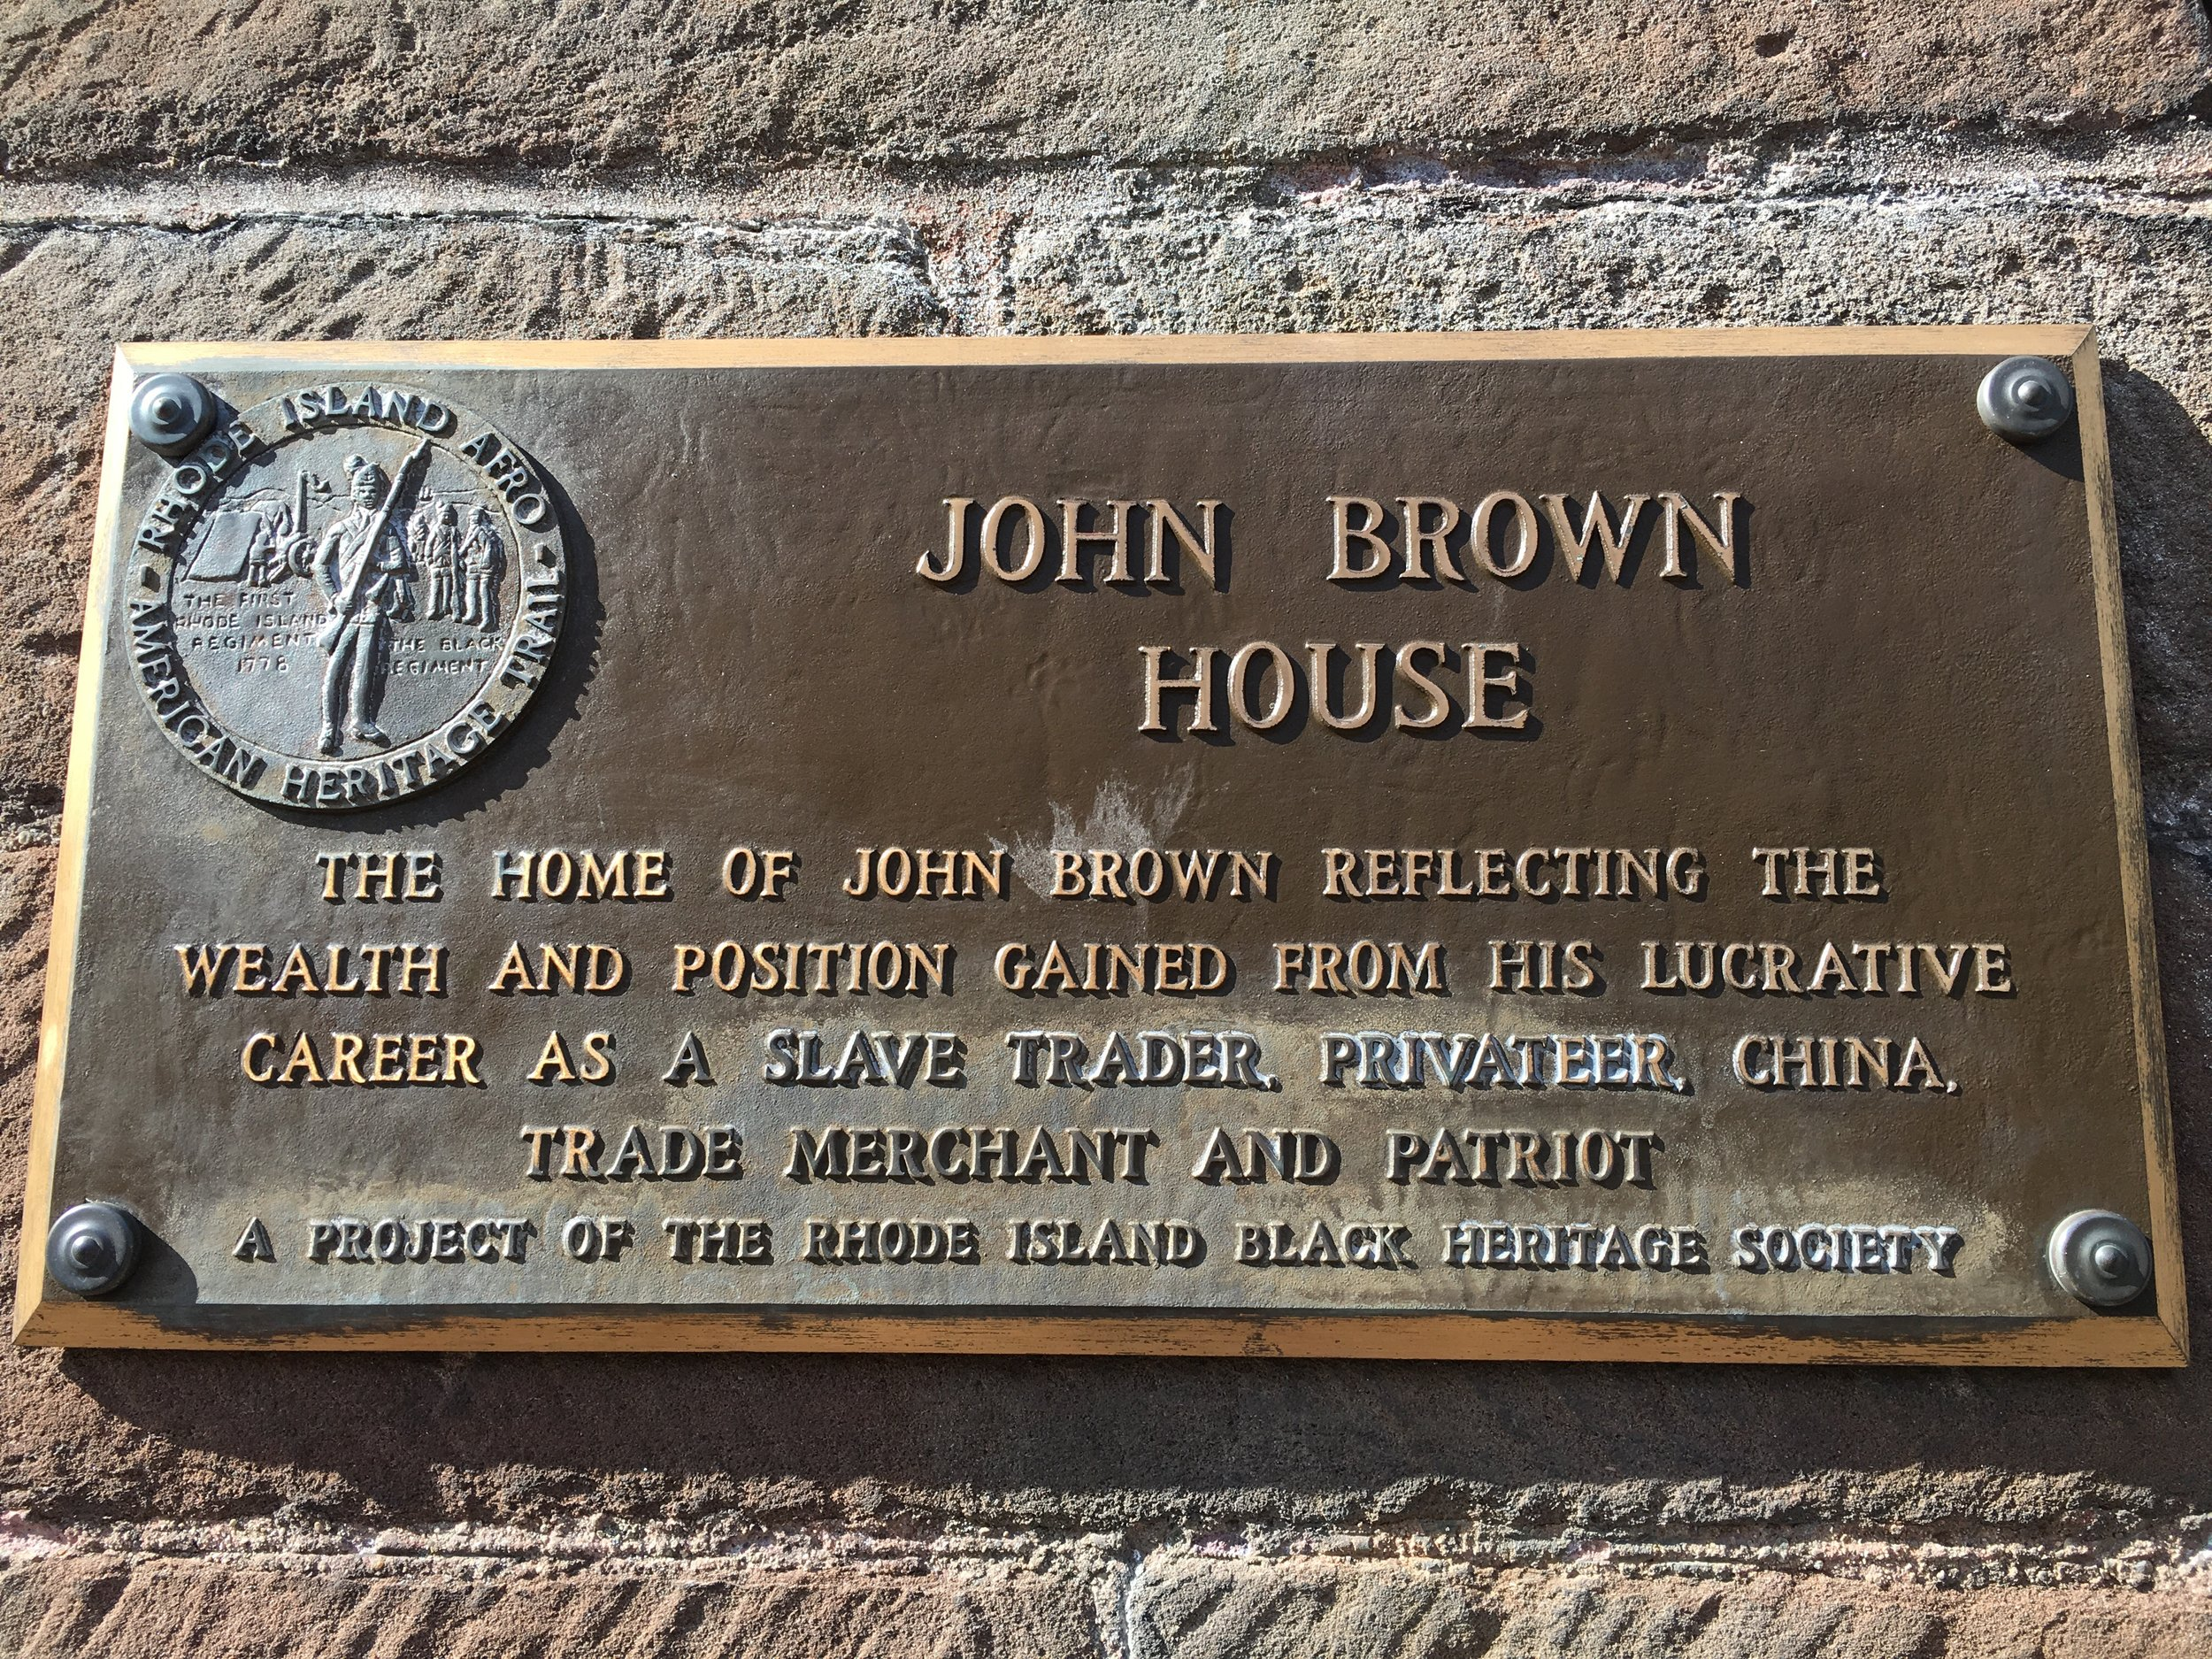 BrownHouse.jpg